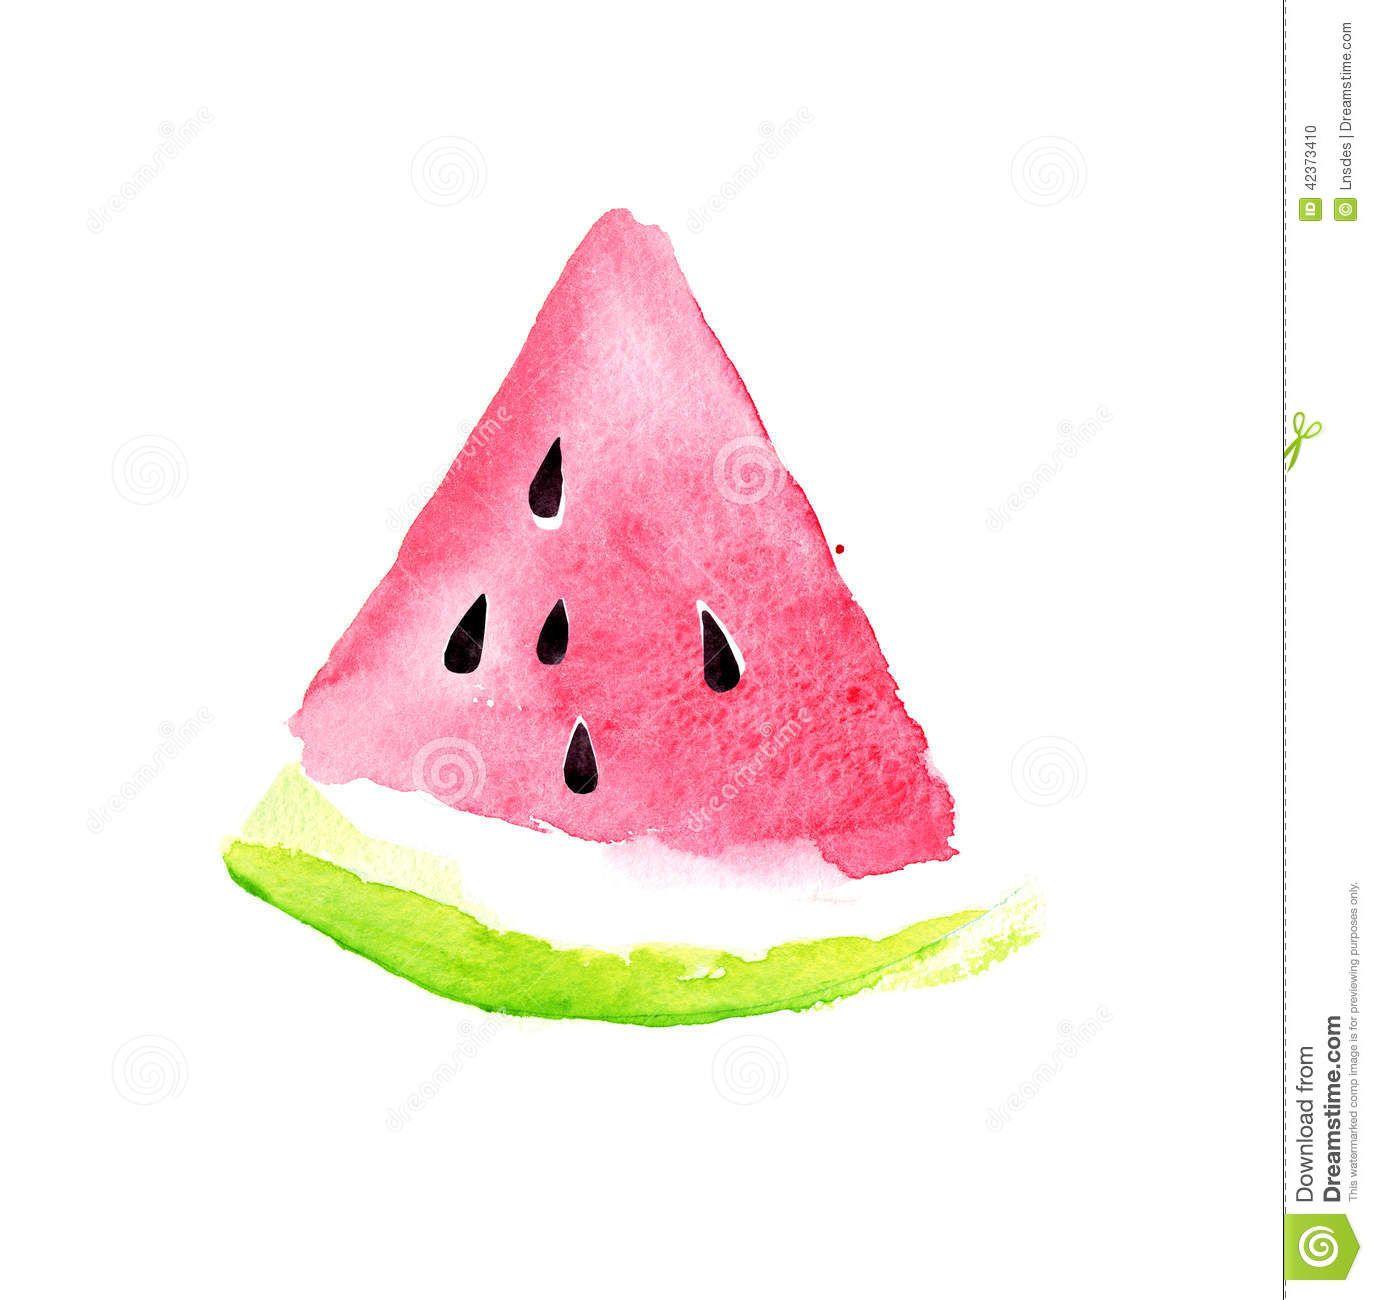 Watermelon Watercolor Google Search Akvarelnye Otkrytki Risunki